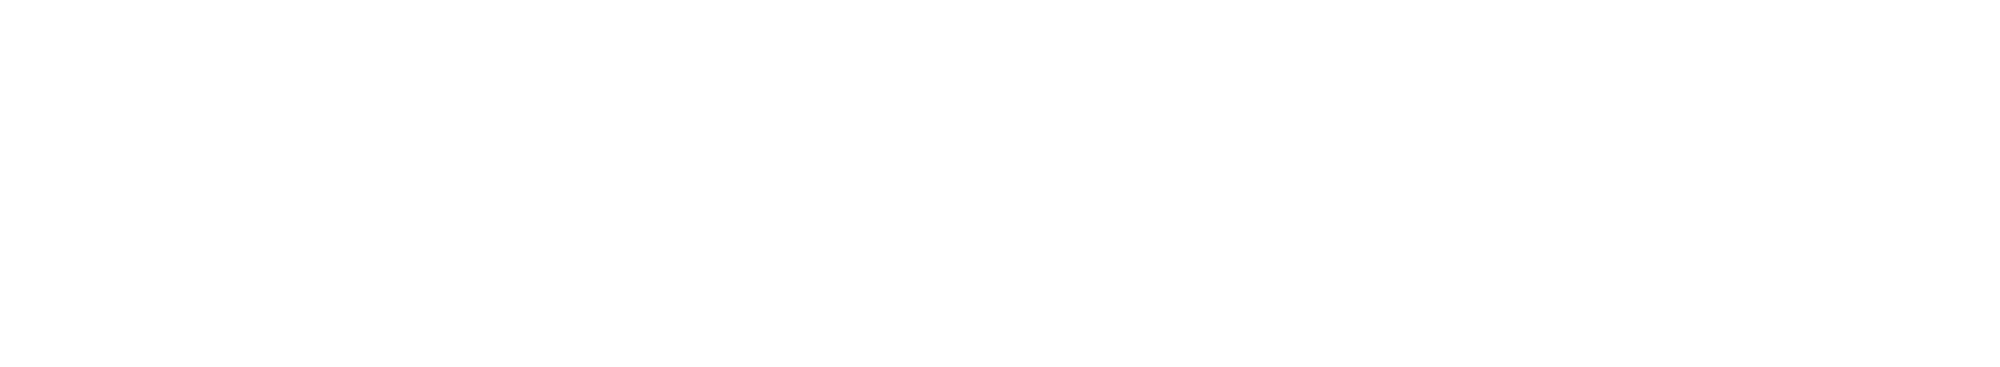 Action Workspace Logo